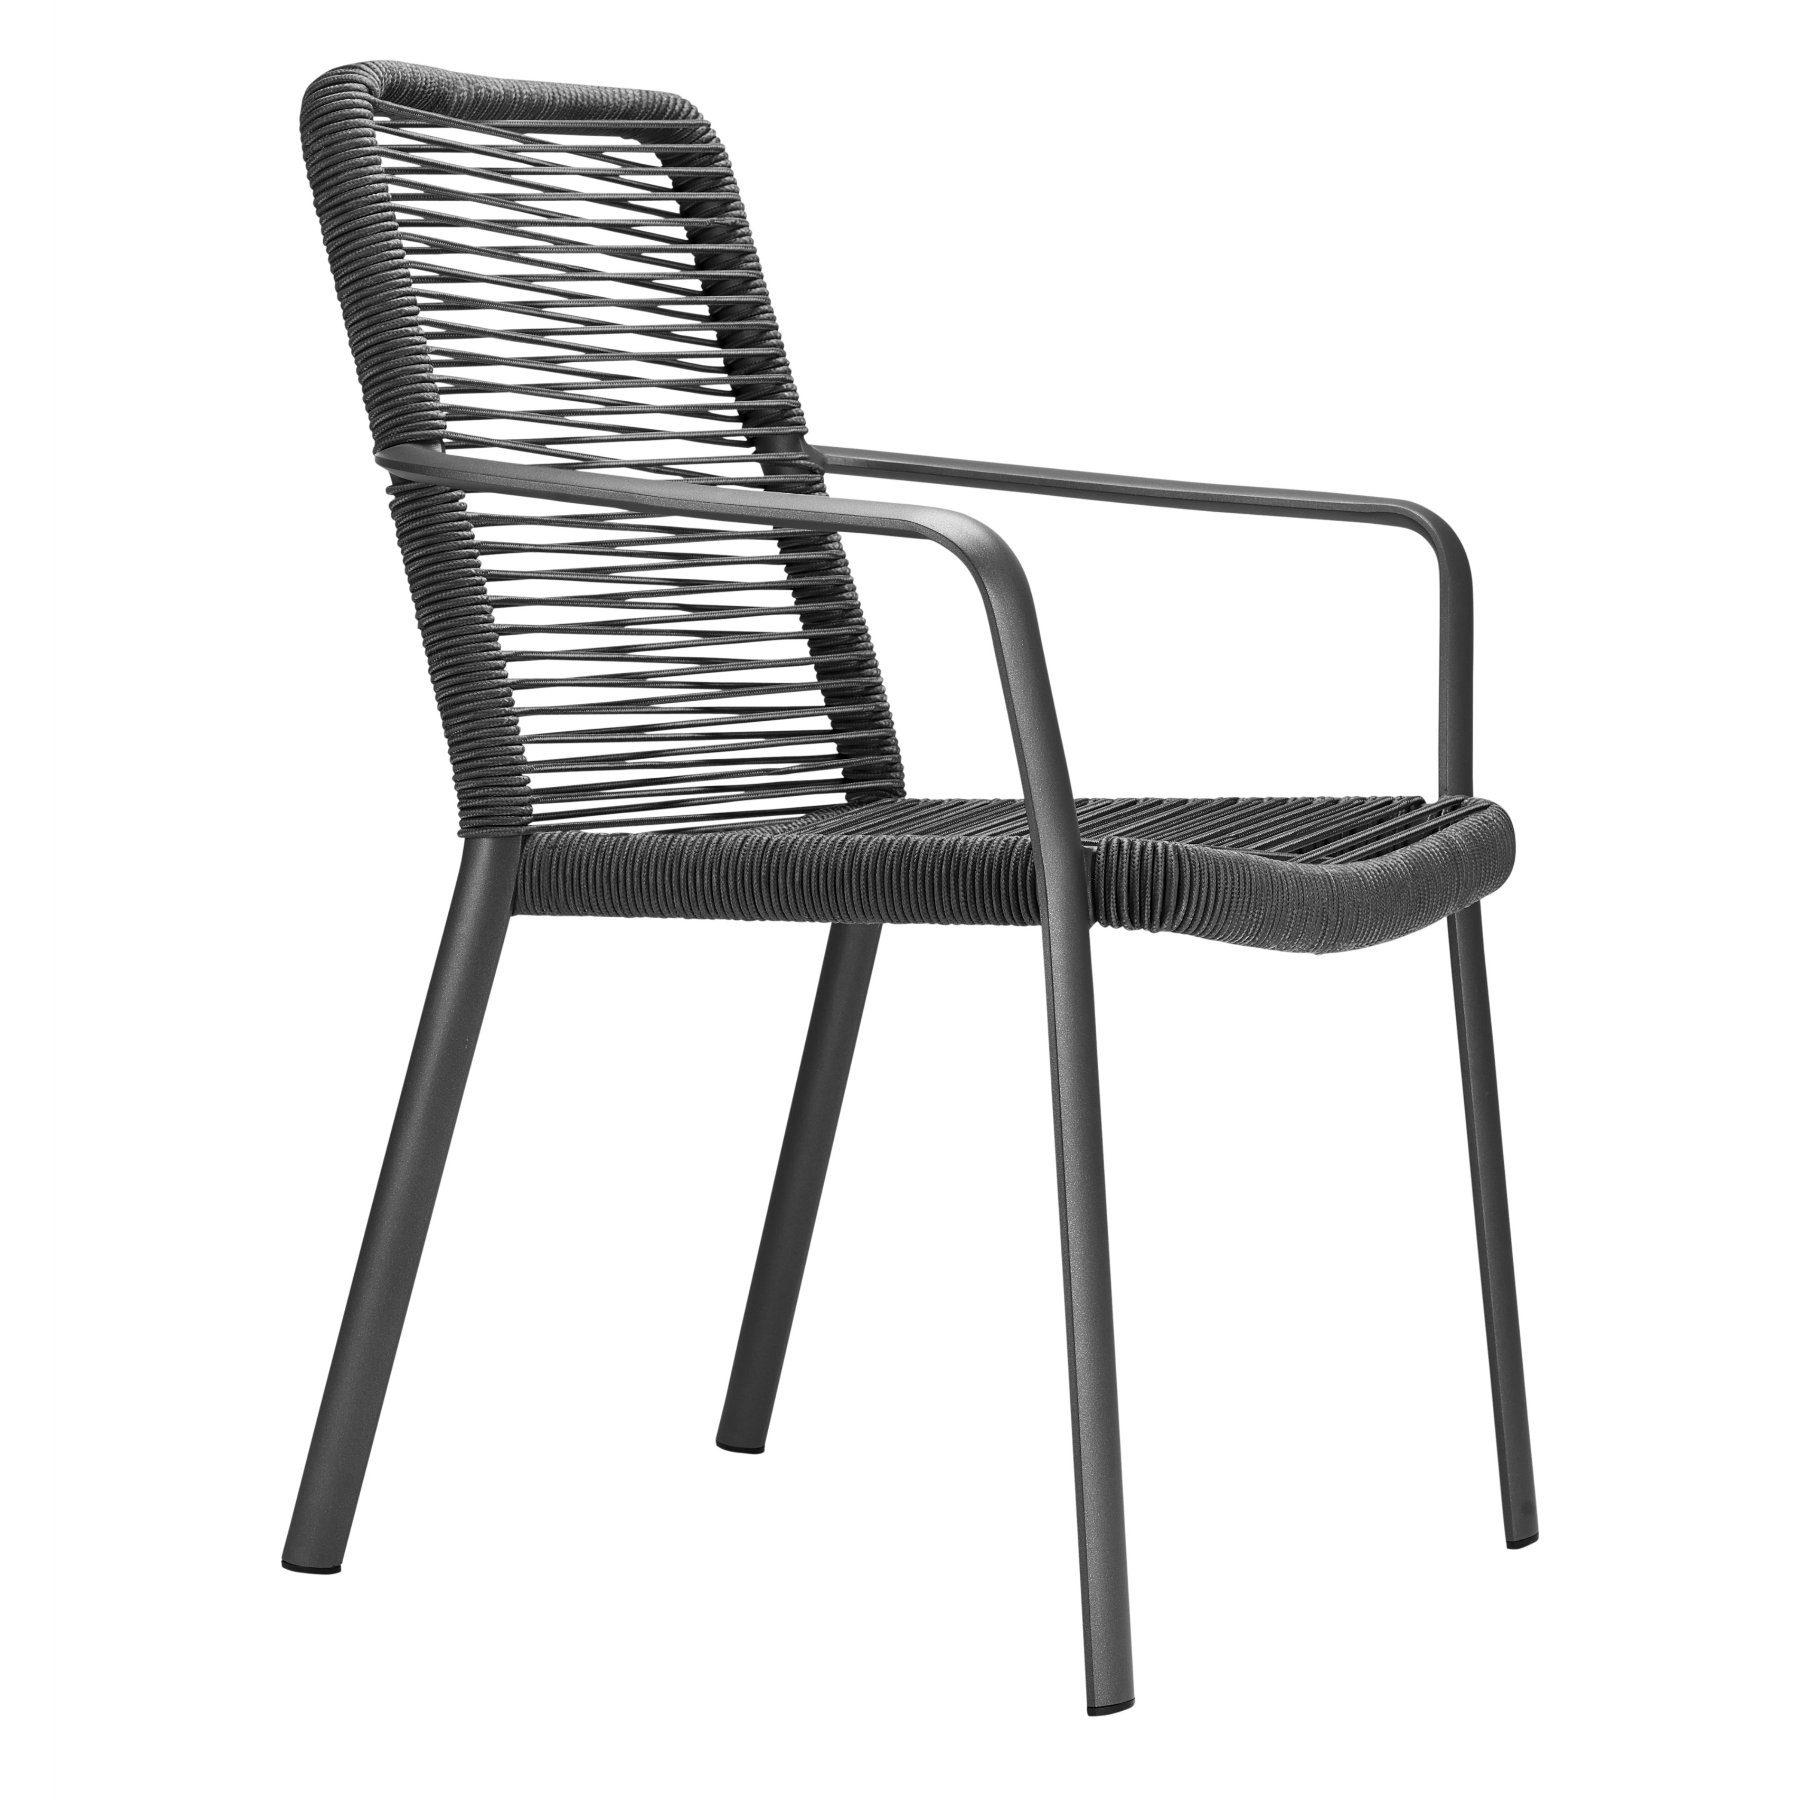 solpuri air stapelsessel. Black Bedroom Furniture Sets. Home Design Ideas